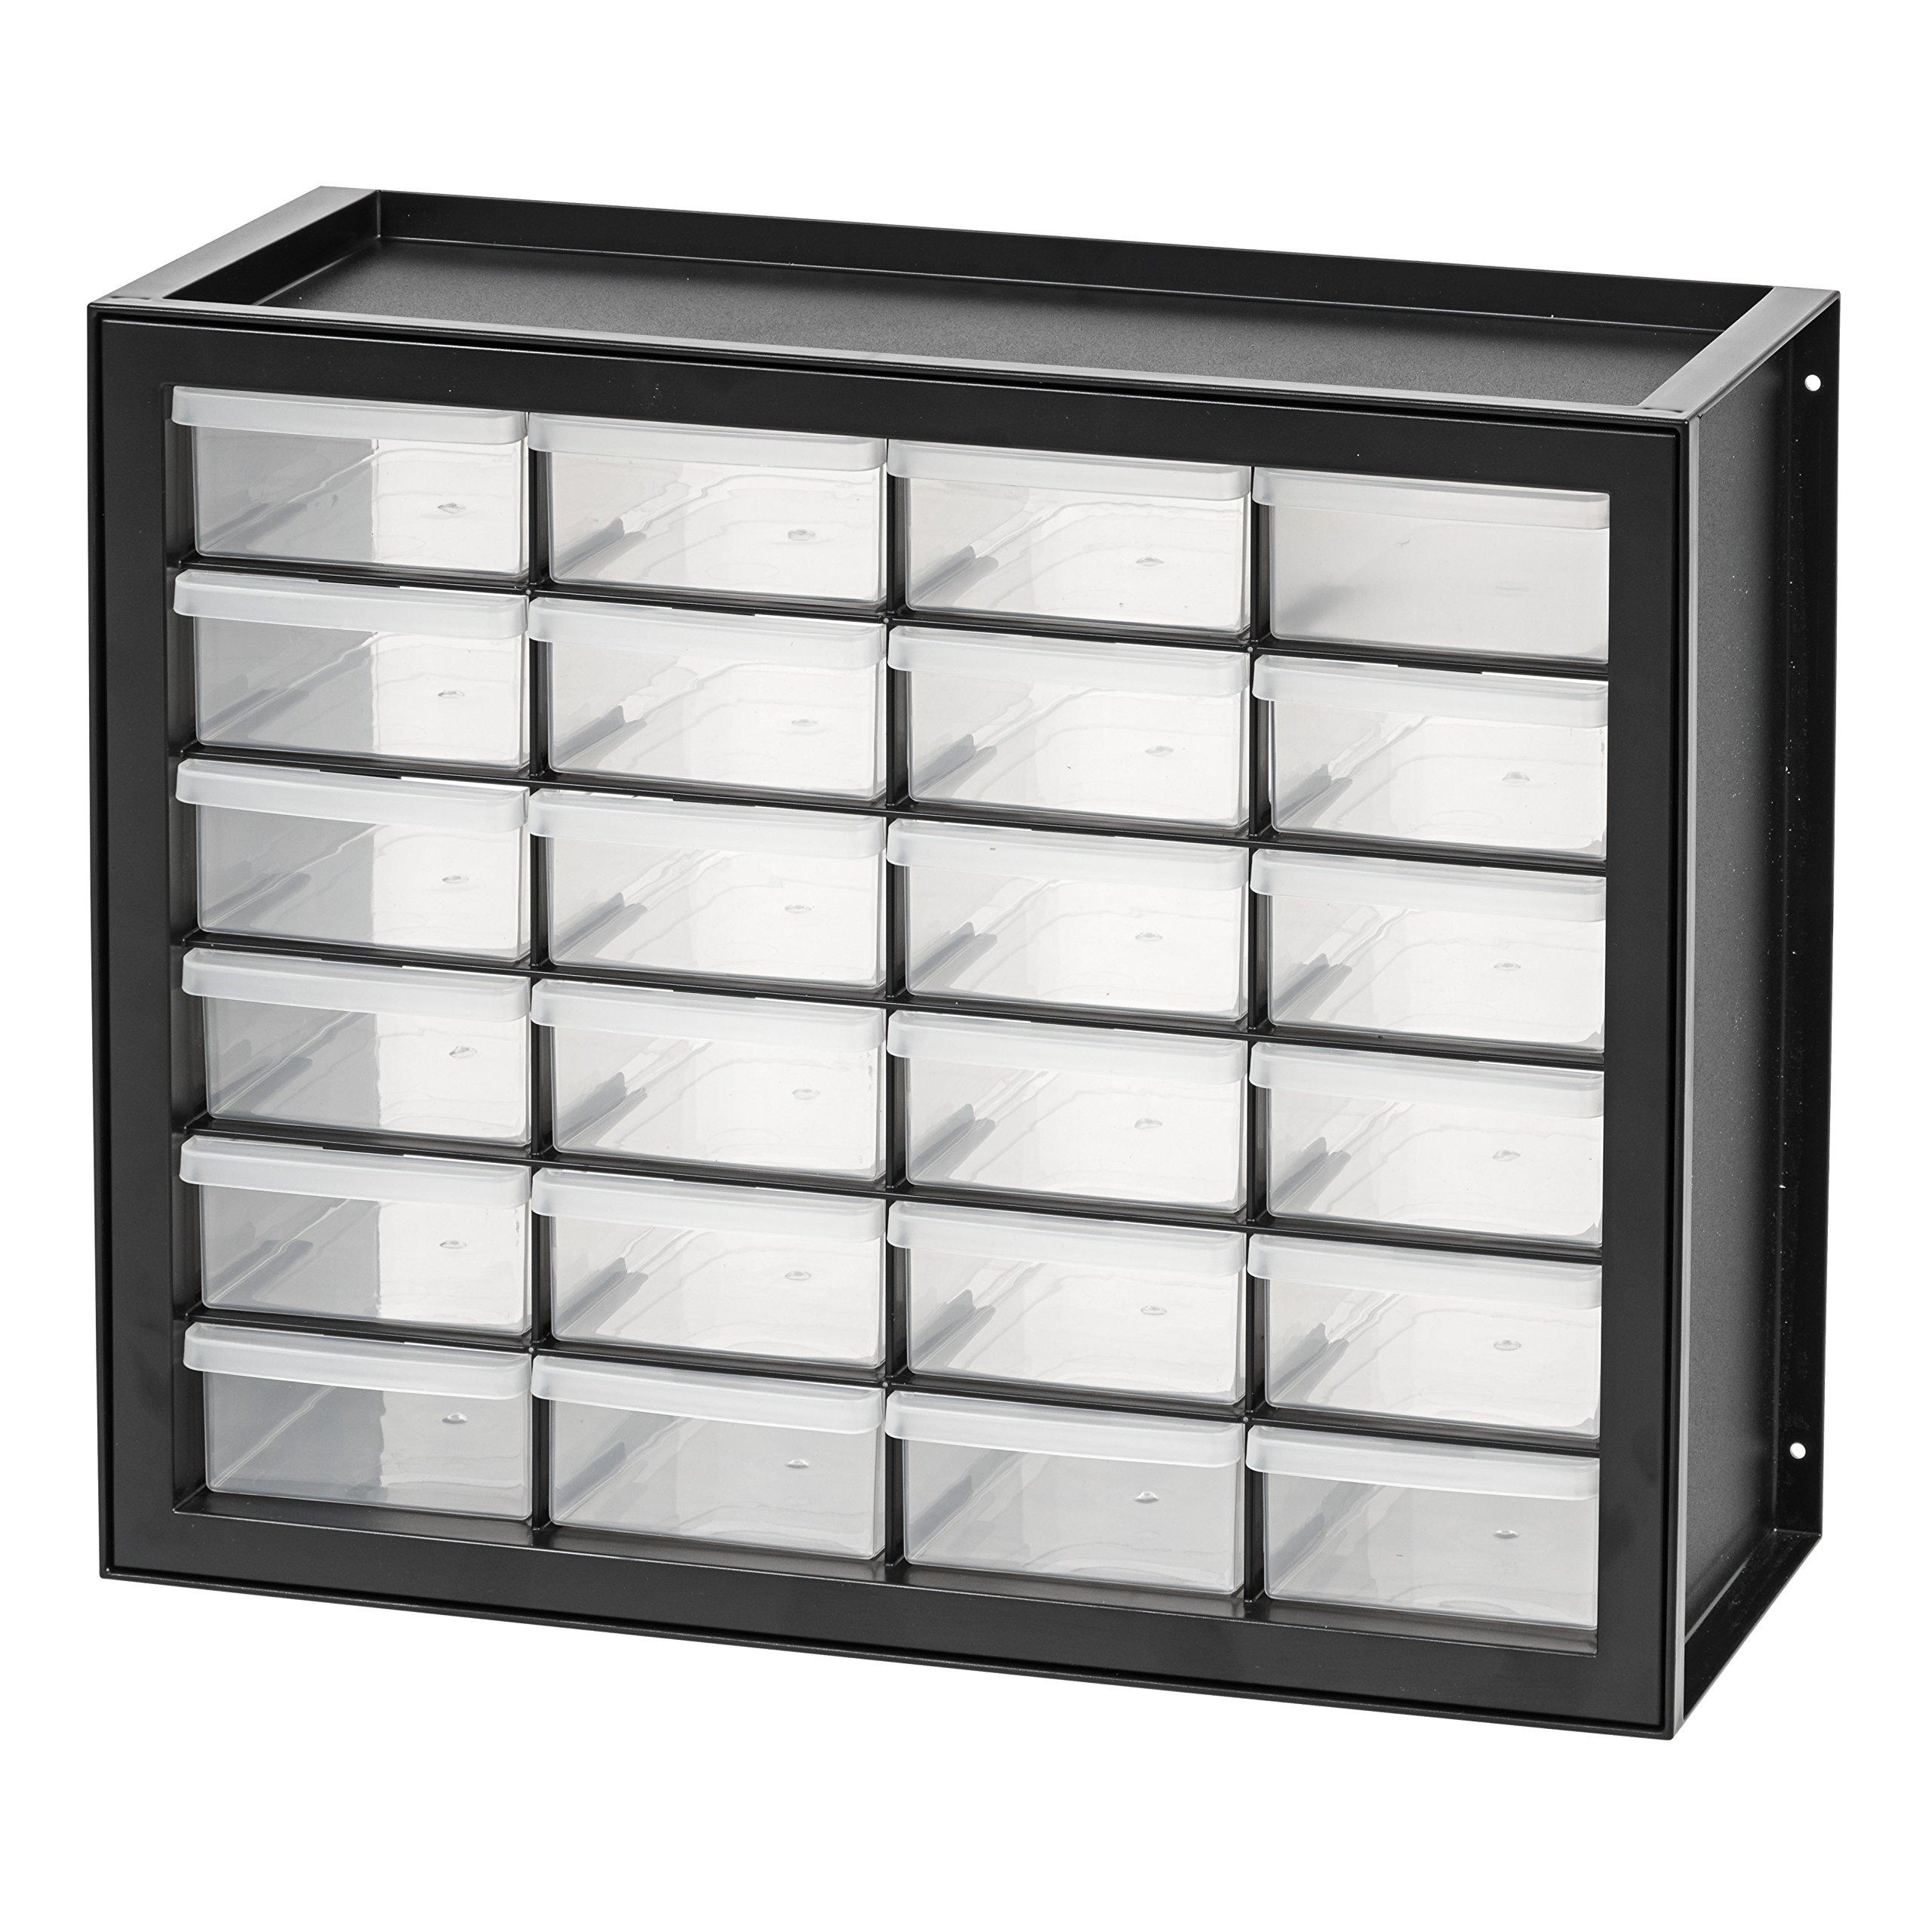 IRIS USA, Inc. DPC-24 24 Drawer Parts and Hardware Cabinet, Black by IRIS USA, Inc.